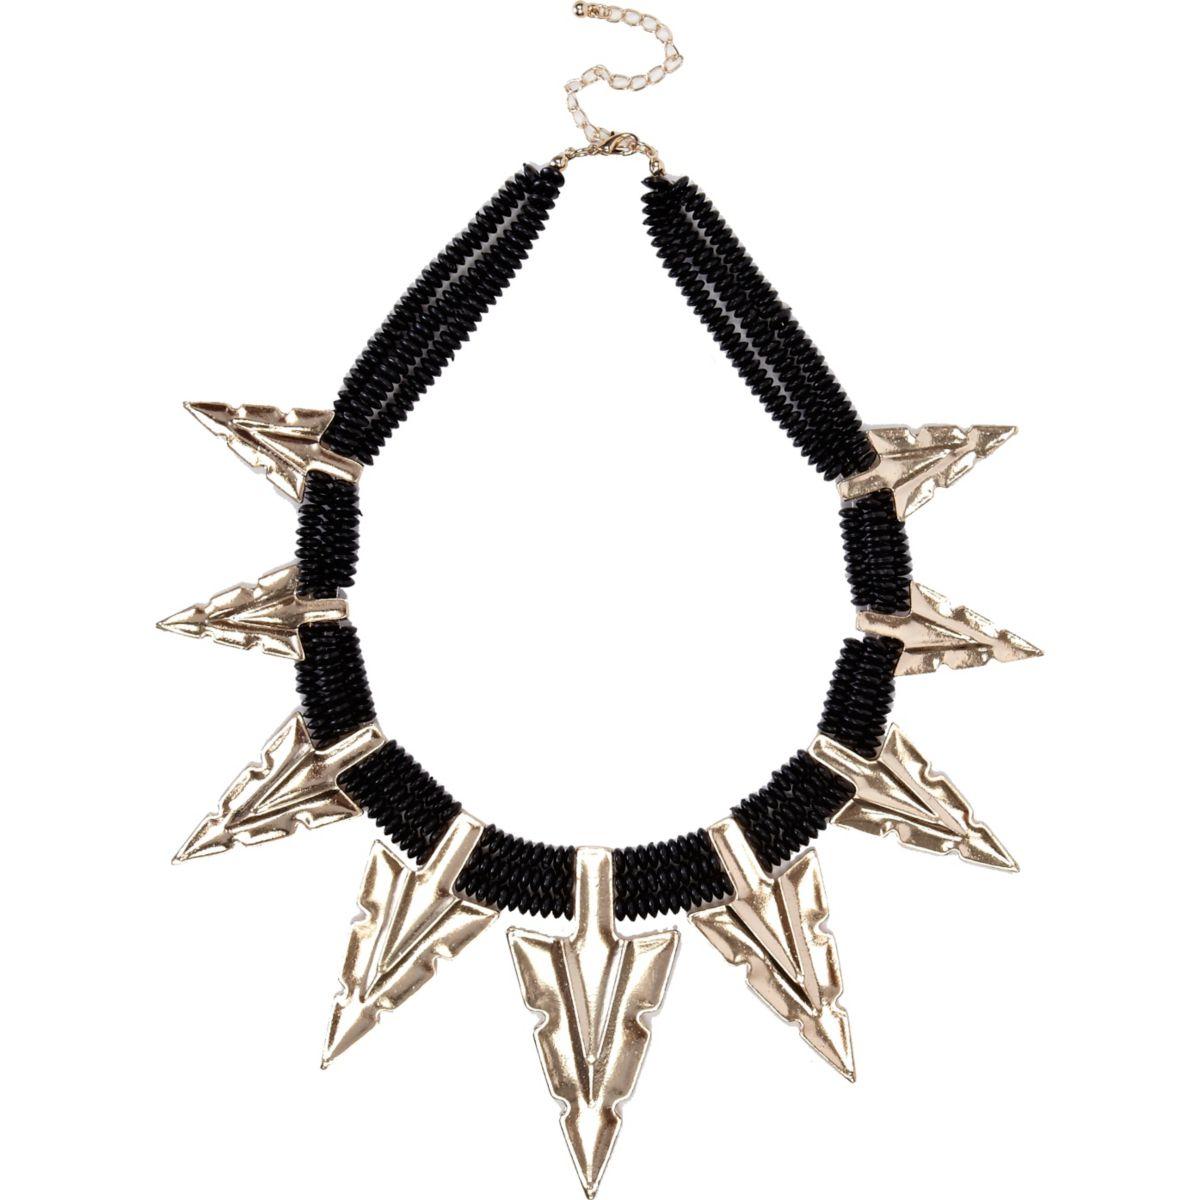 Black oversized arrowhead statement necklace